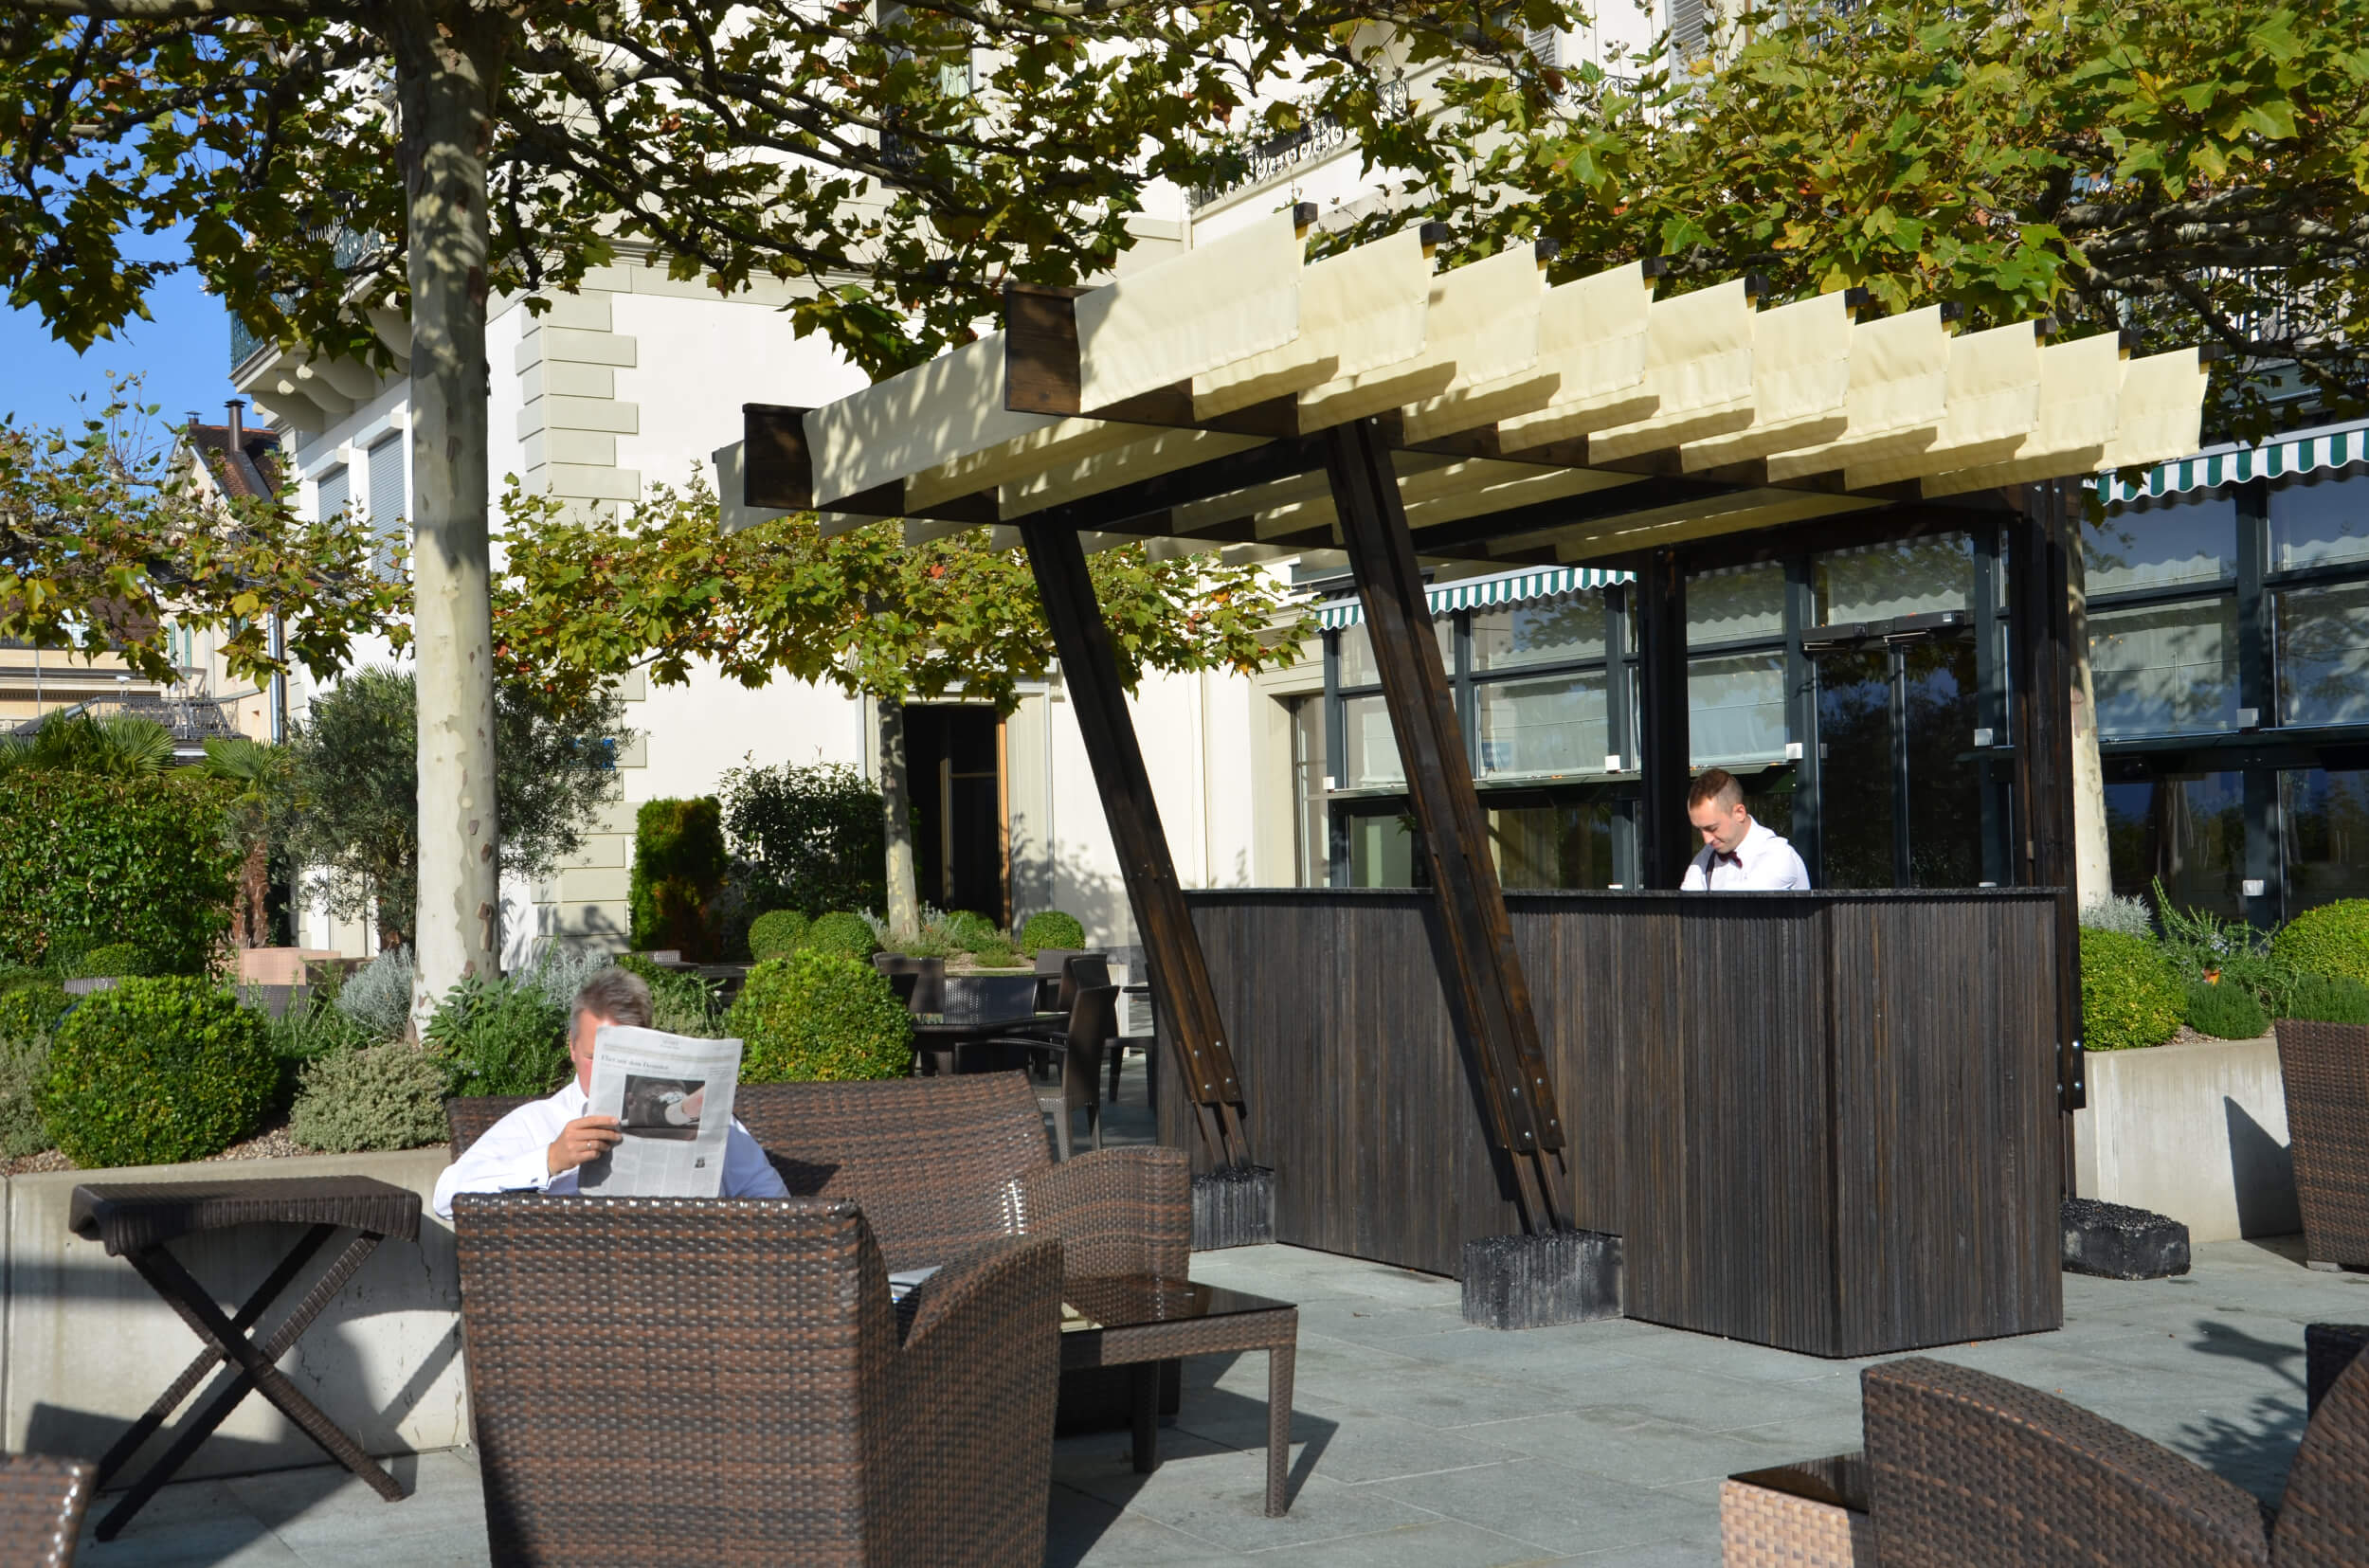 Architecture Pavilion in a hotel Switzerland